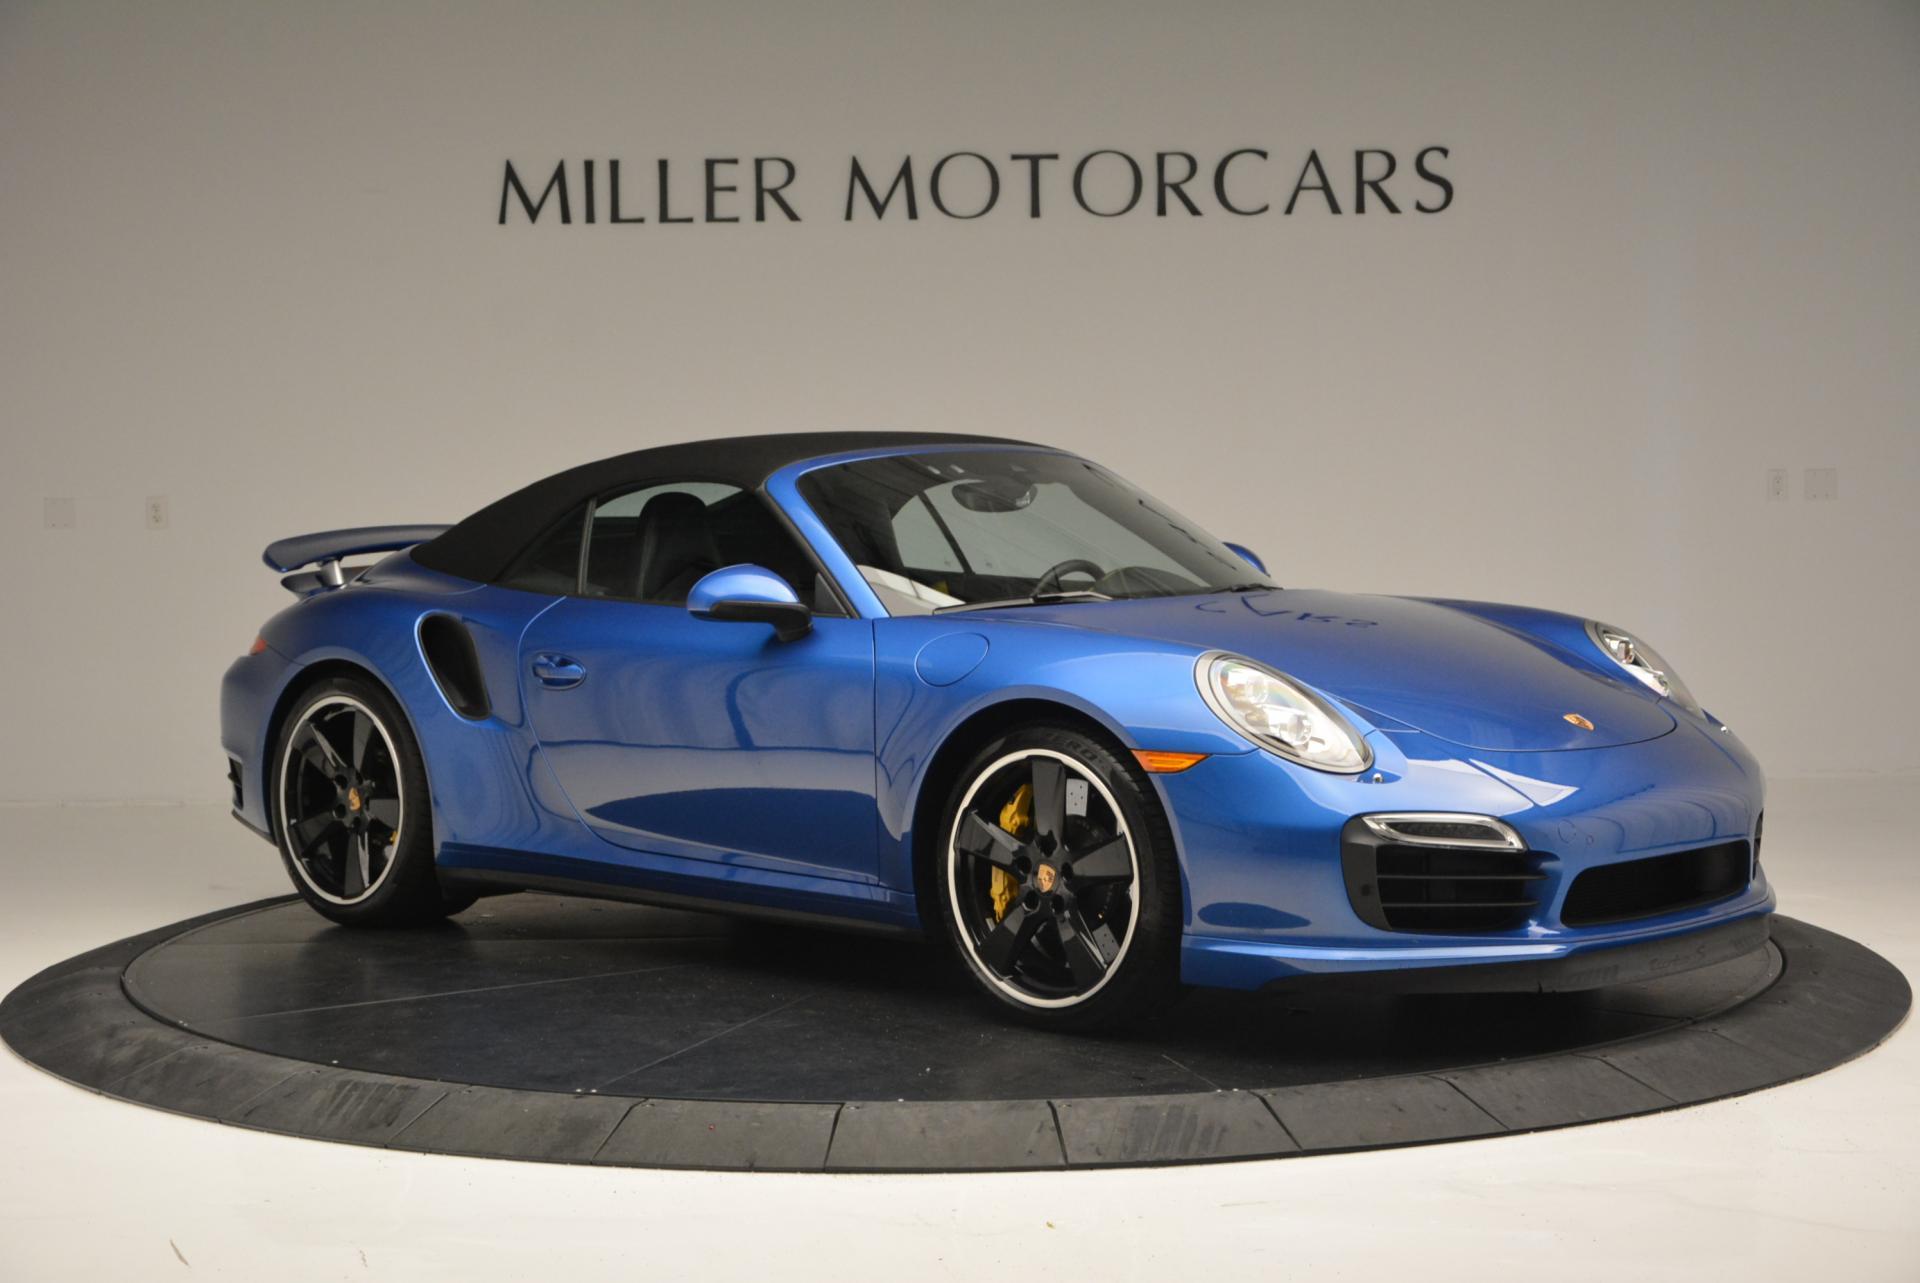 Used 2014 Porsche 911 Turbo S For Sale In Greenwich, CT 105_p16